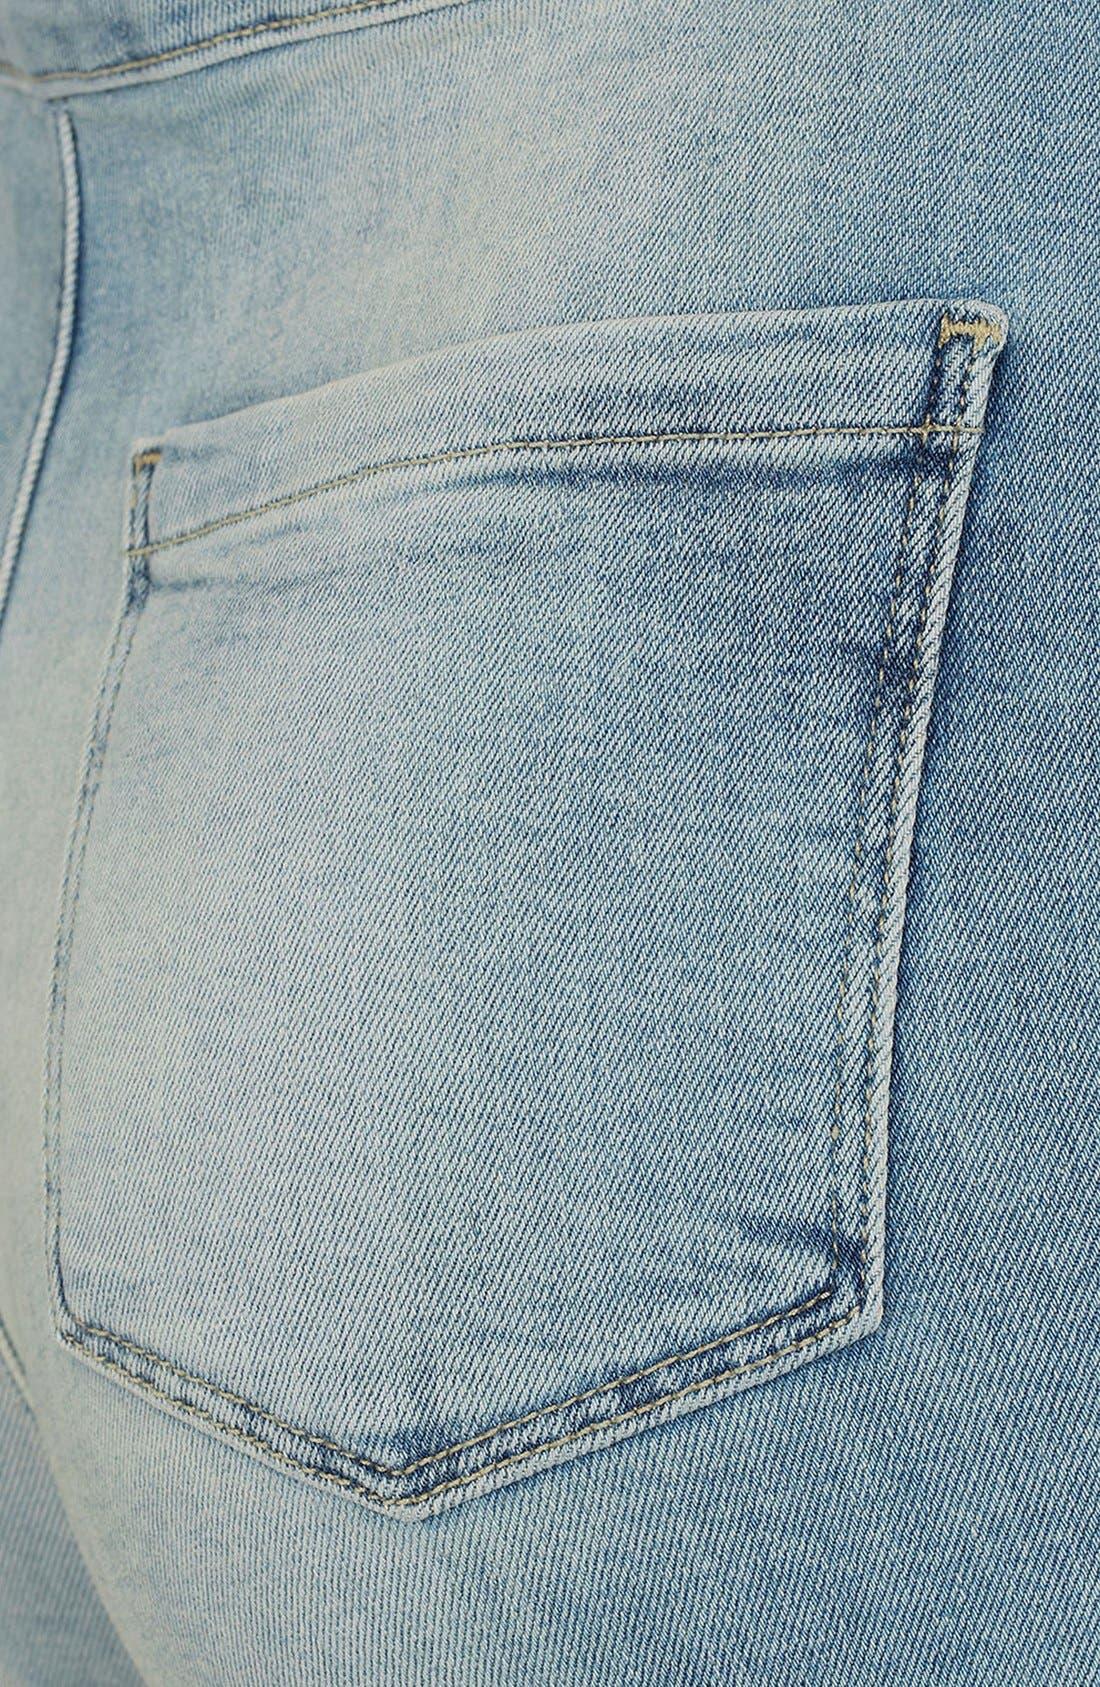 Moto 'Francis' Denim Hot Pants,                             Alternate thumbnail 3, color,                             450